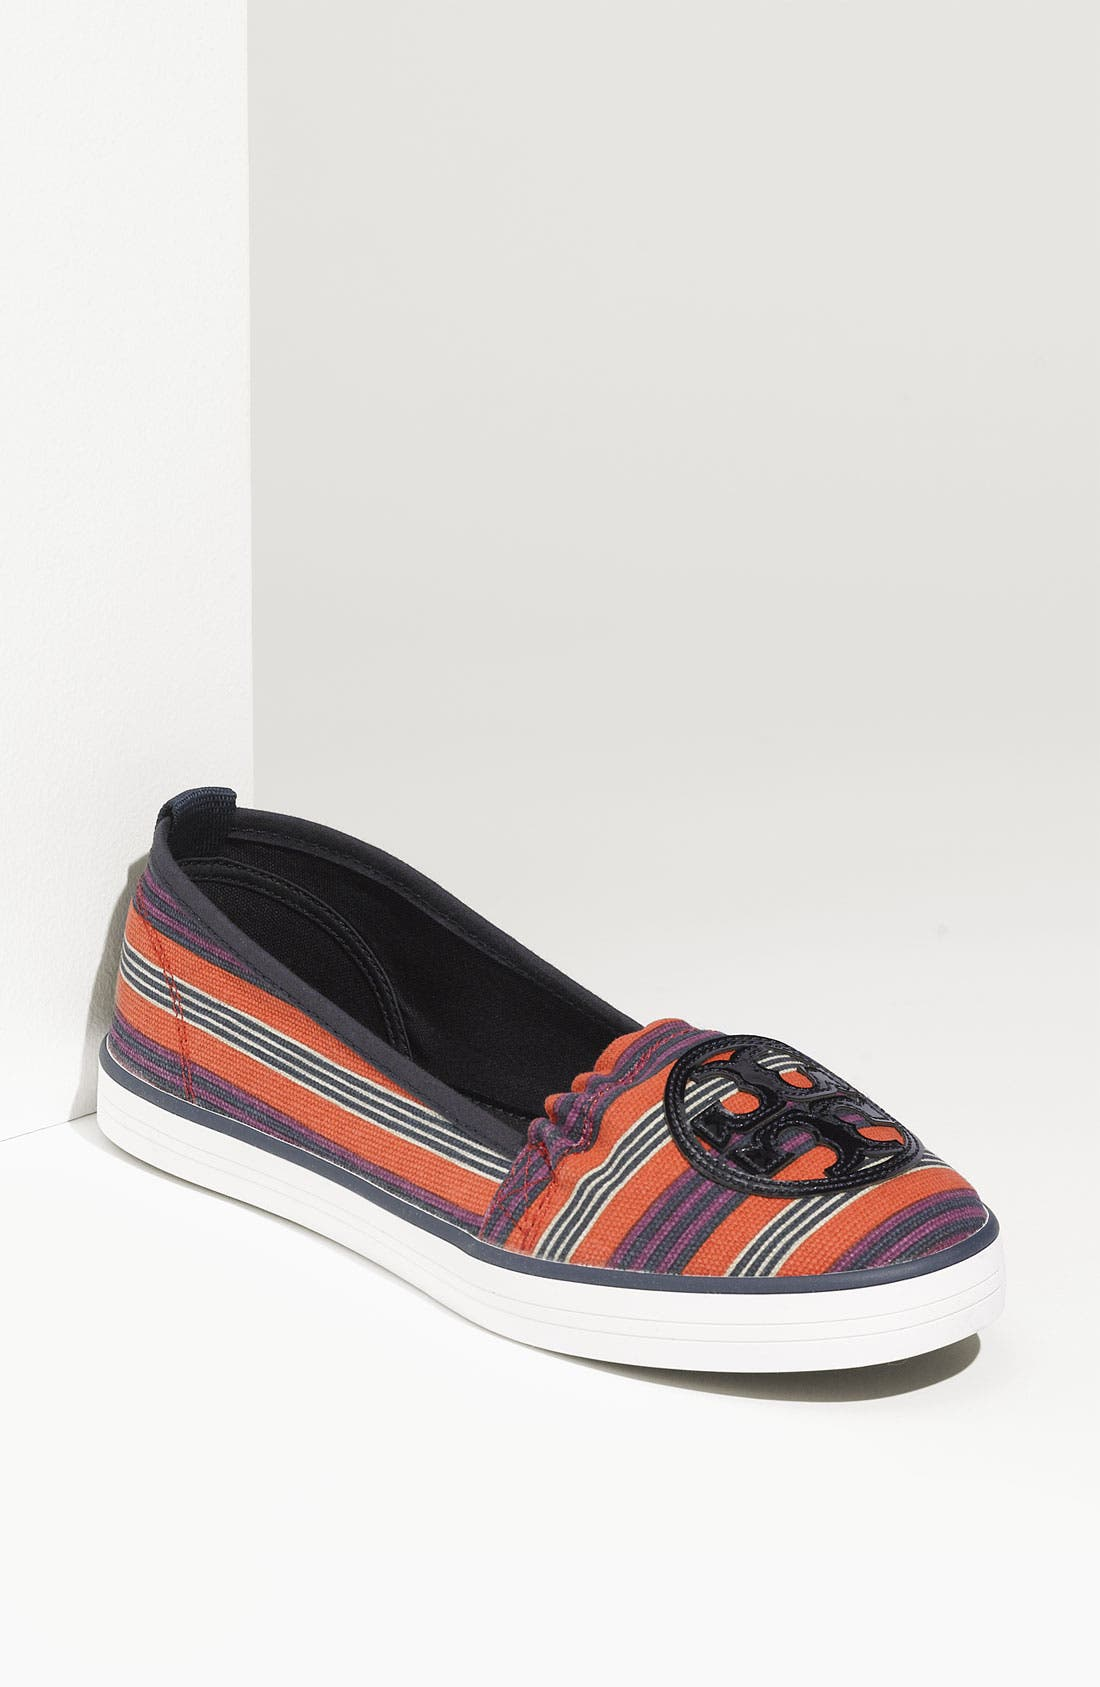 Main Image - Tory Burch Slip On Sneaker